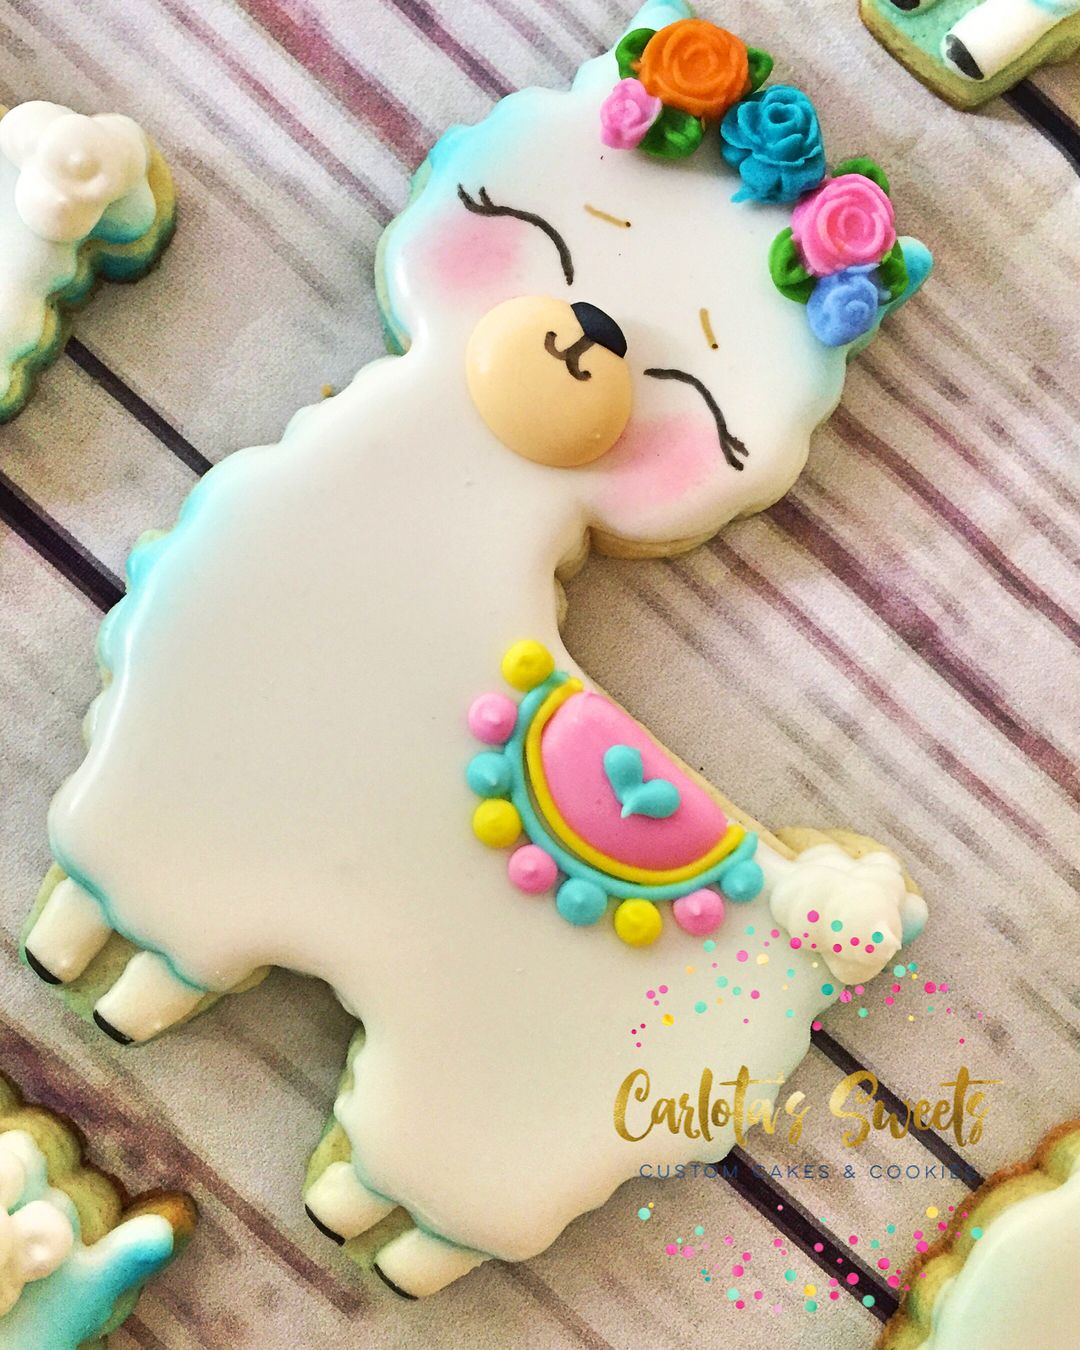 Pin von Kelly Krueger auf Royal icing Cookies | Pinterest | Kekse ...